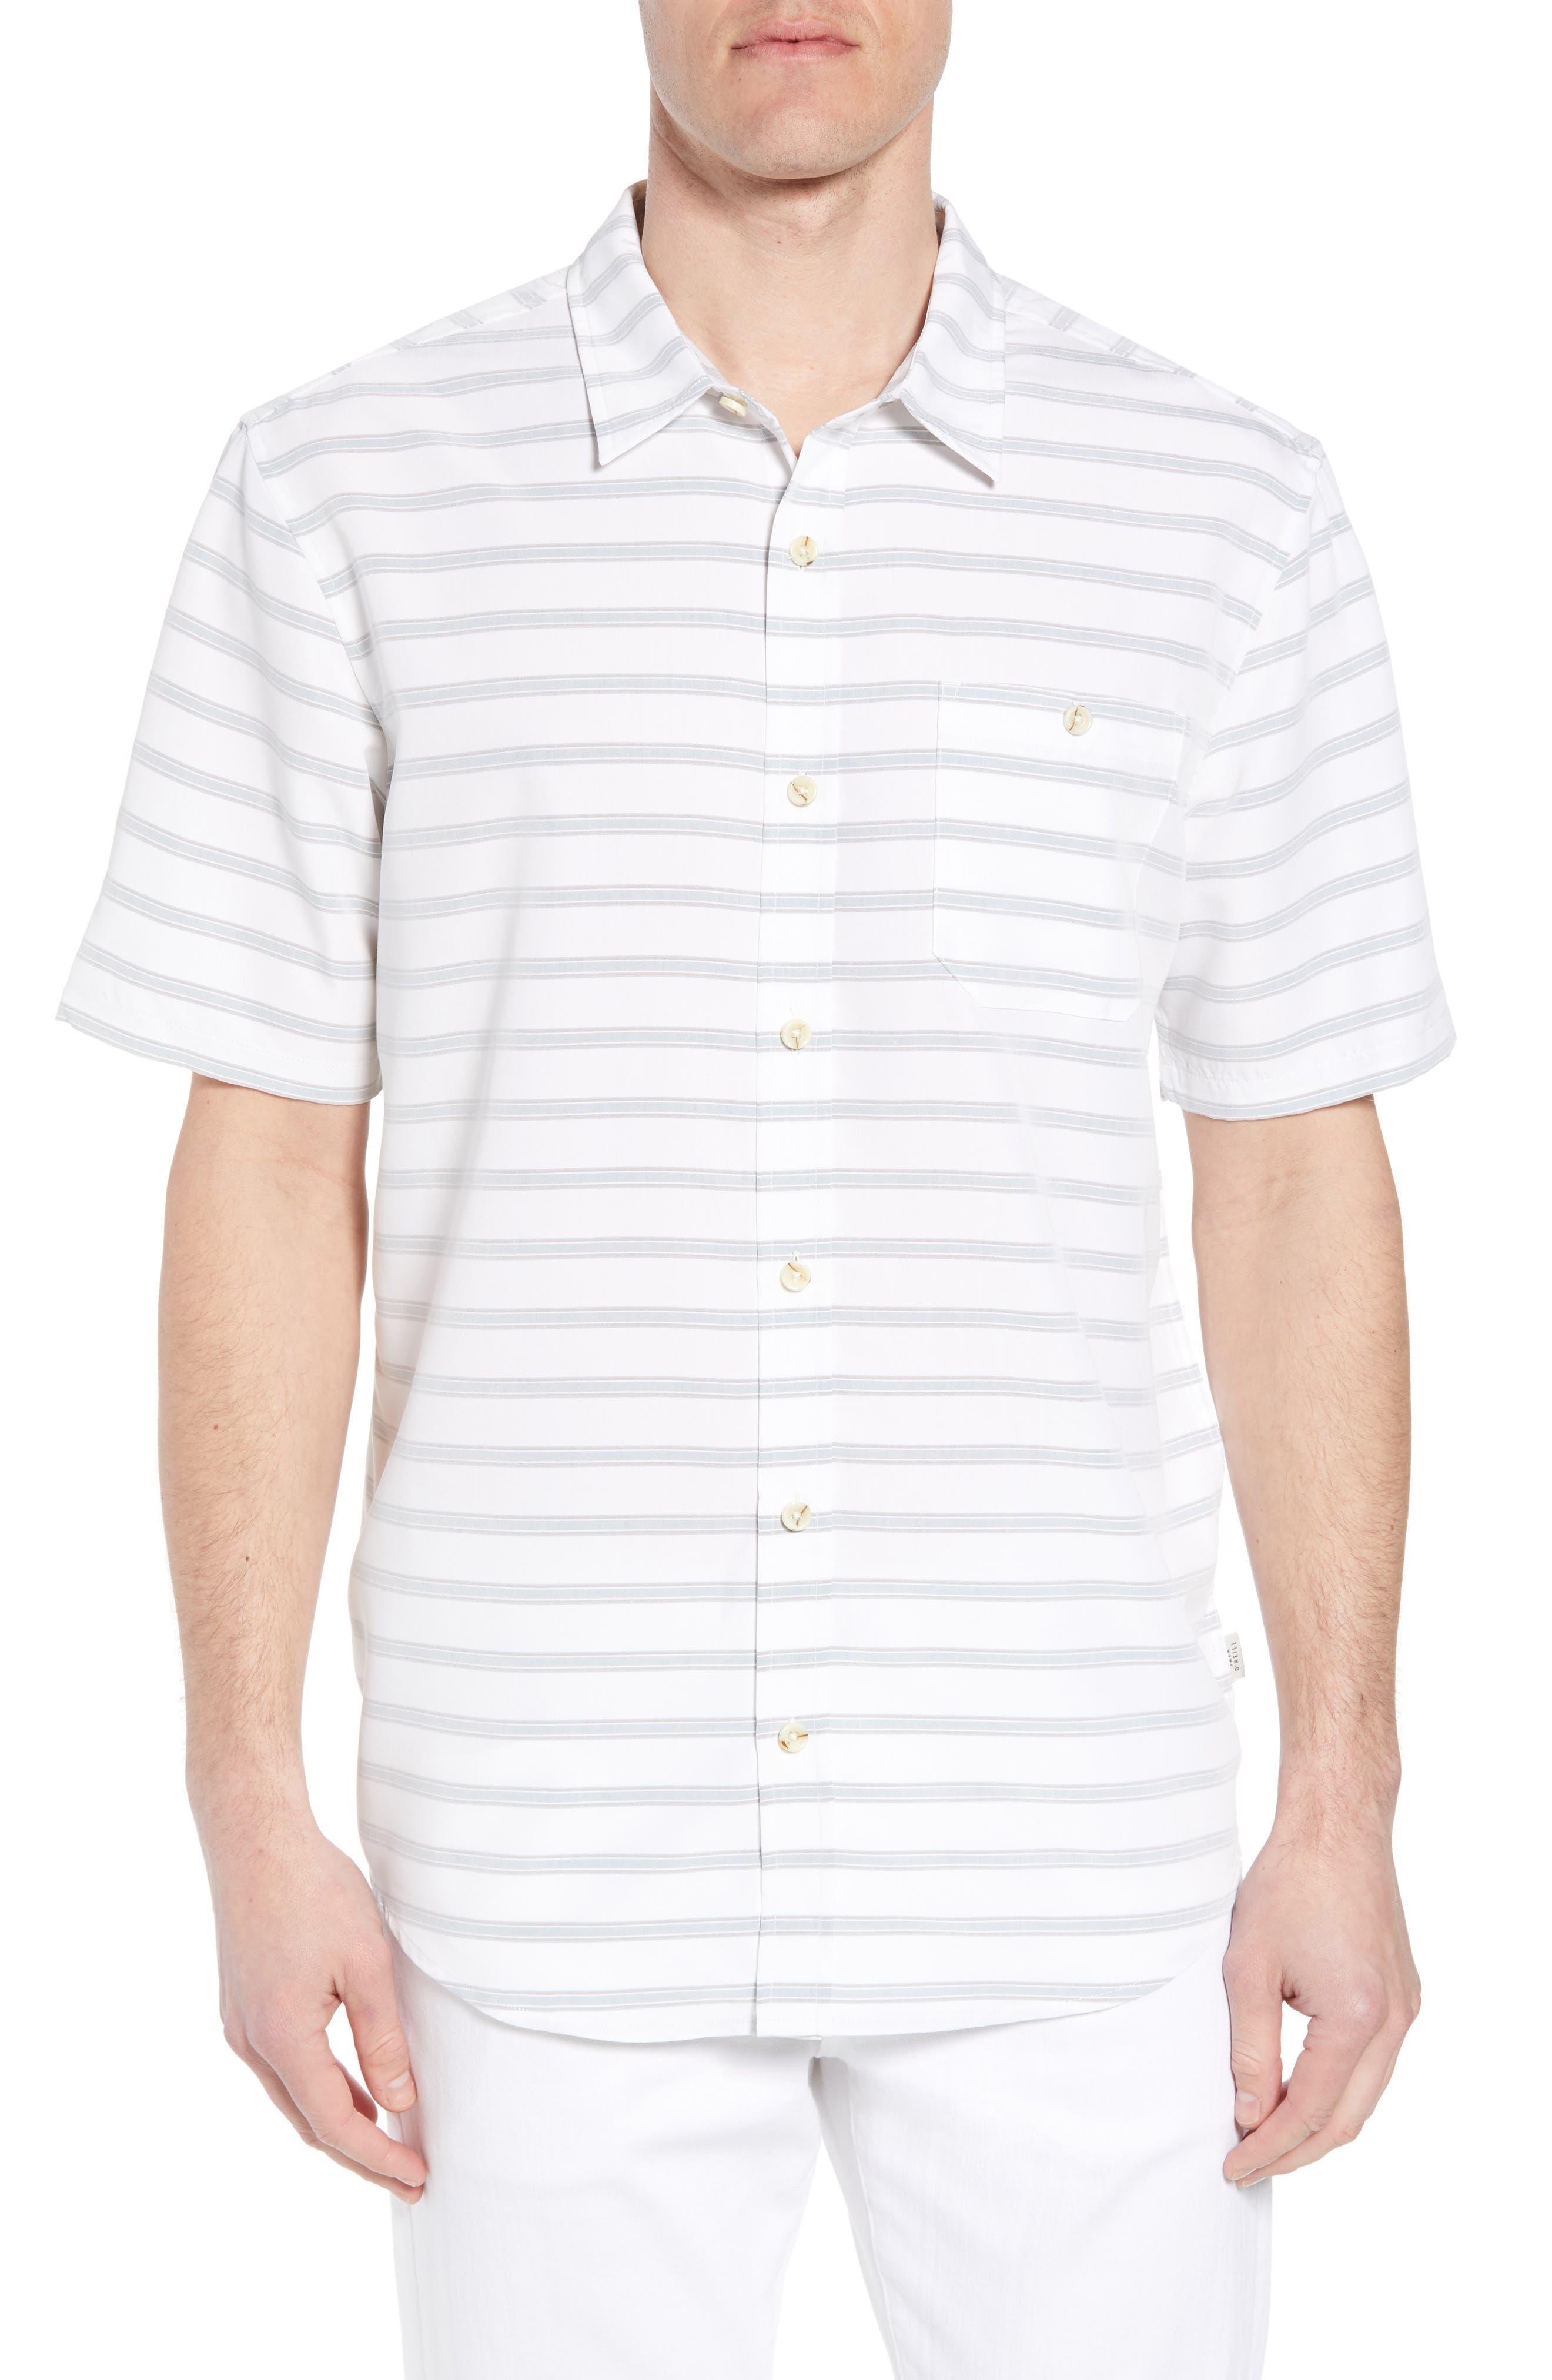 Slow Ride Sport Shirt,                         Main,                         color, 100